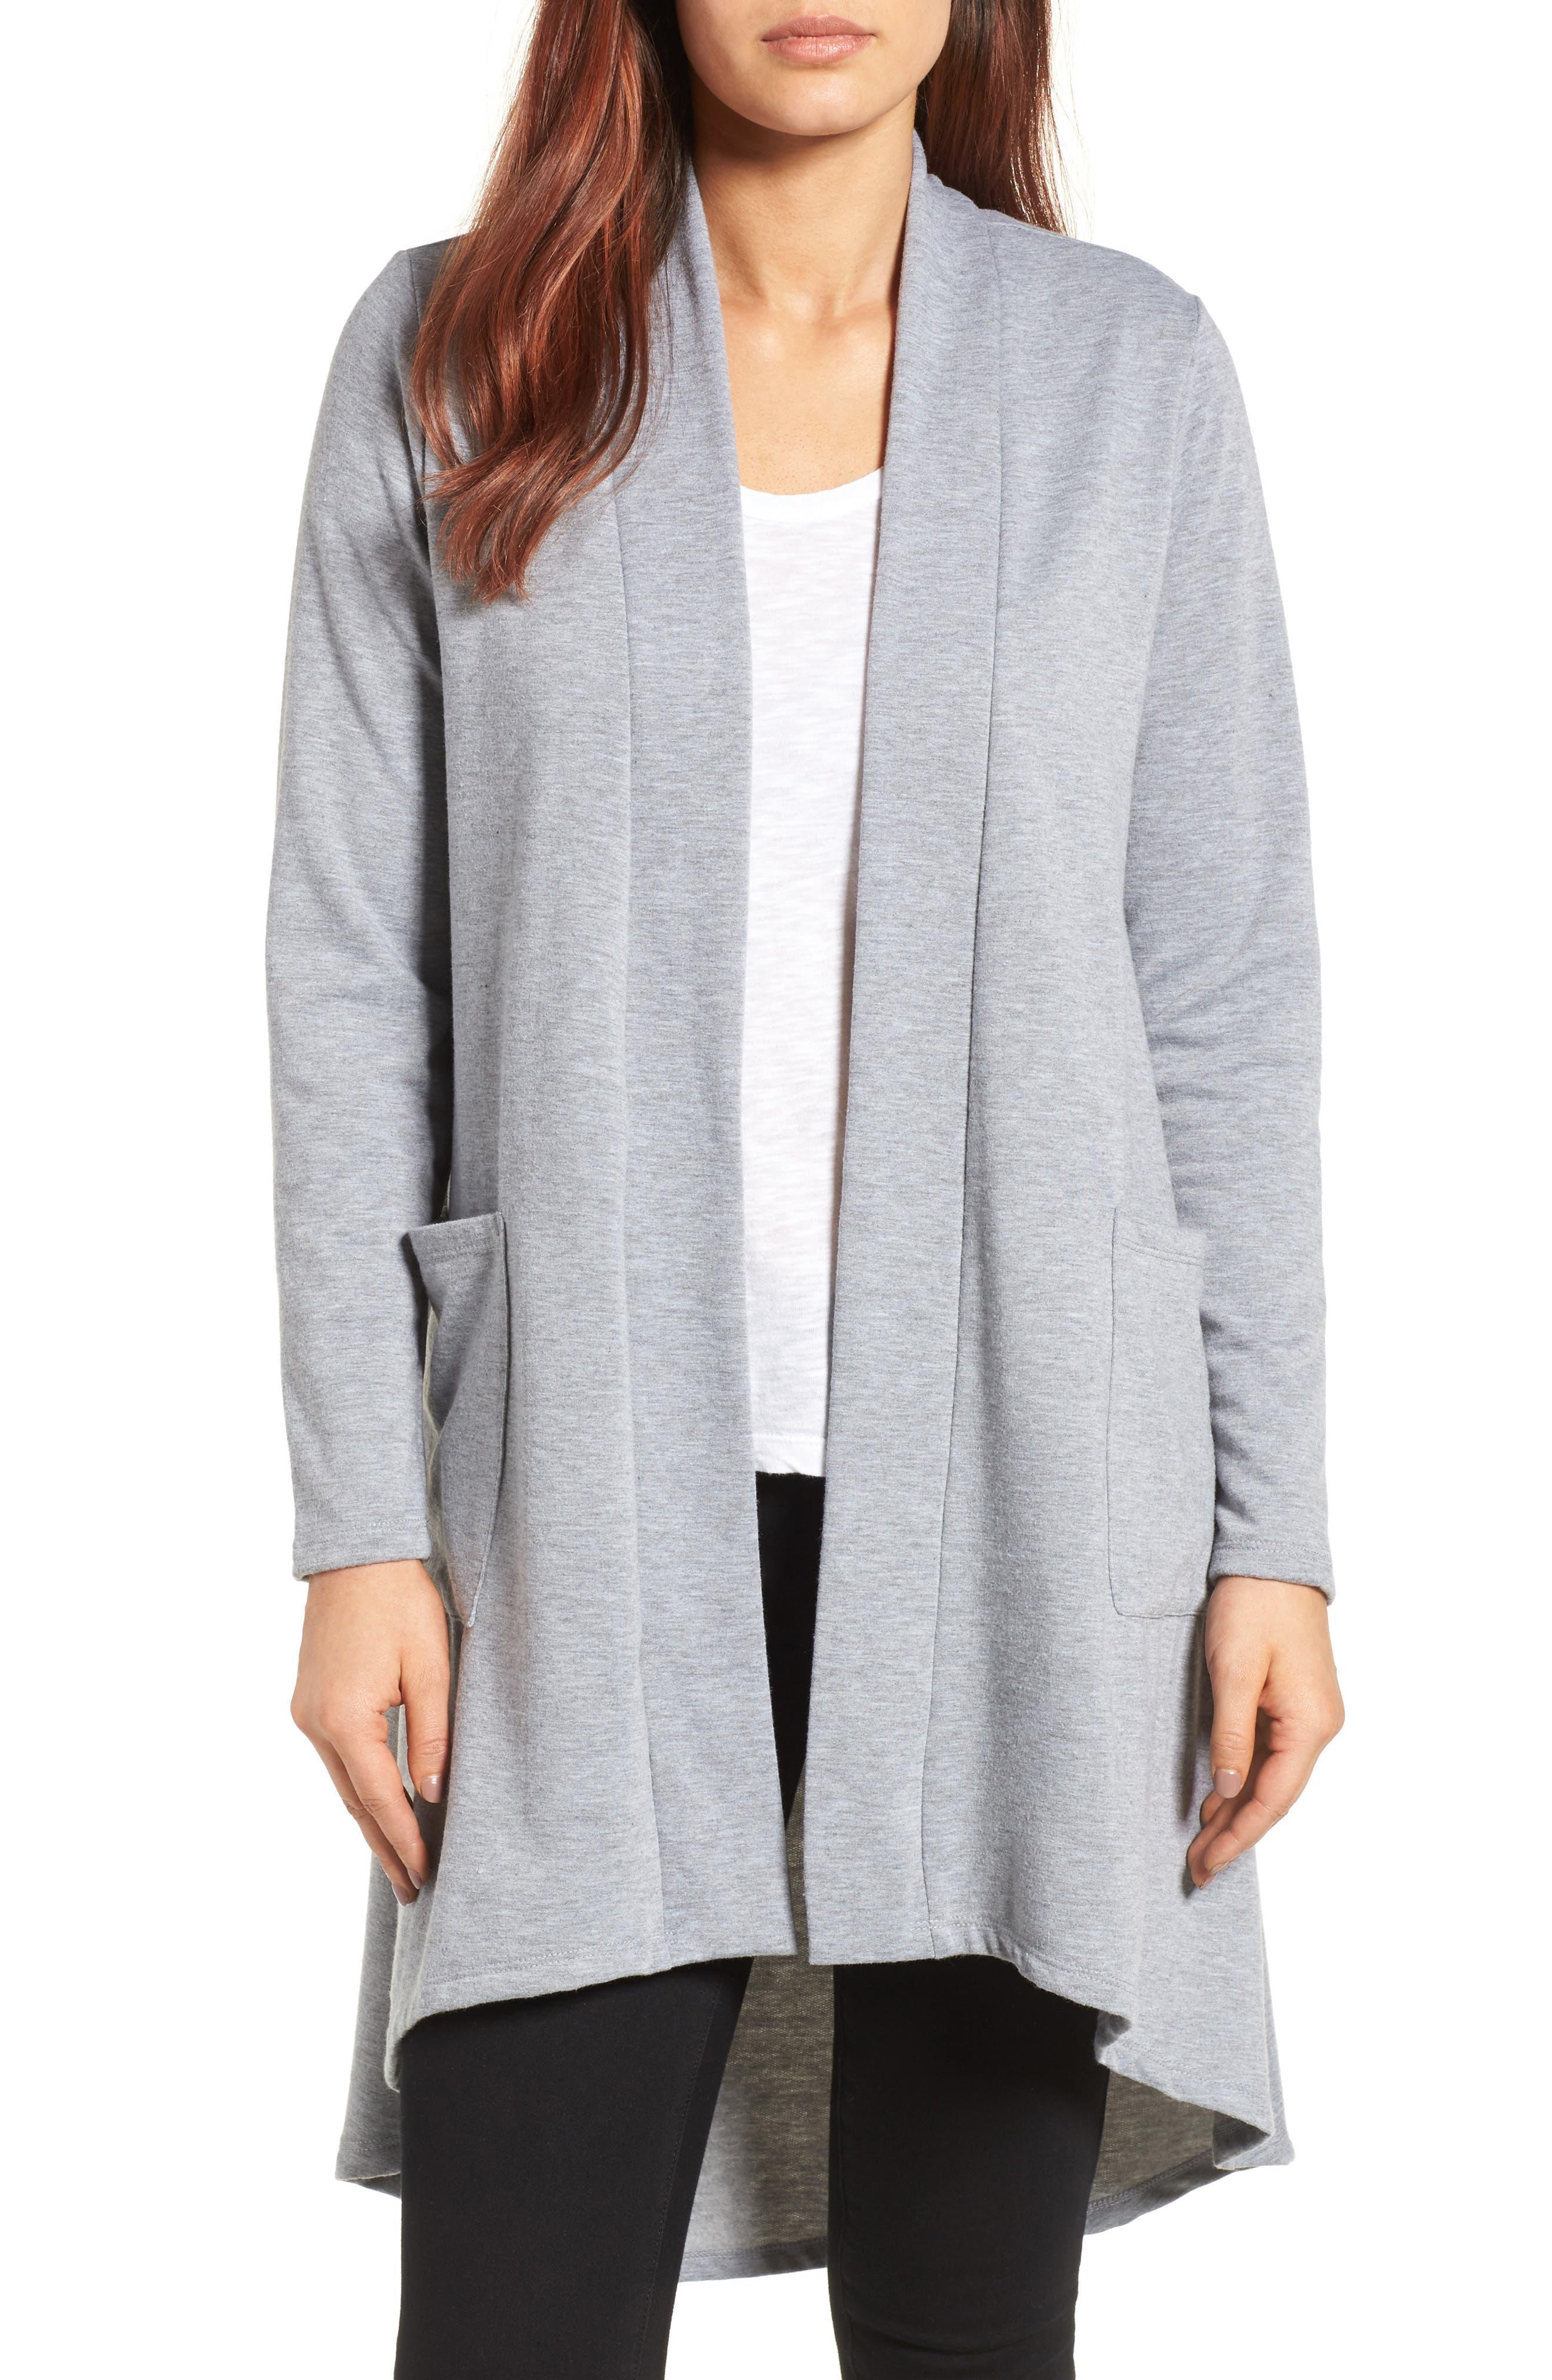 Alternate Image 1 Selected - Bobeau High/Low Fleece Knit Cardigan (Regular & Petite)